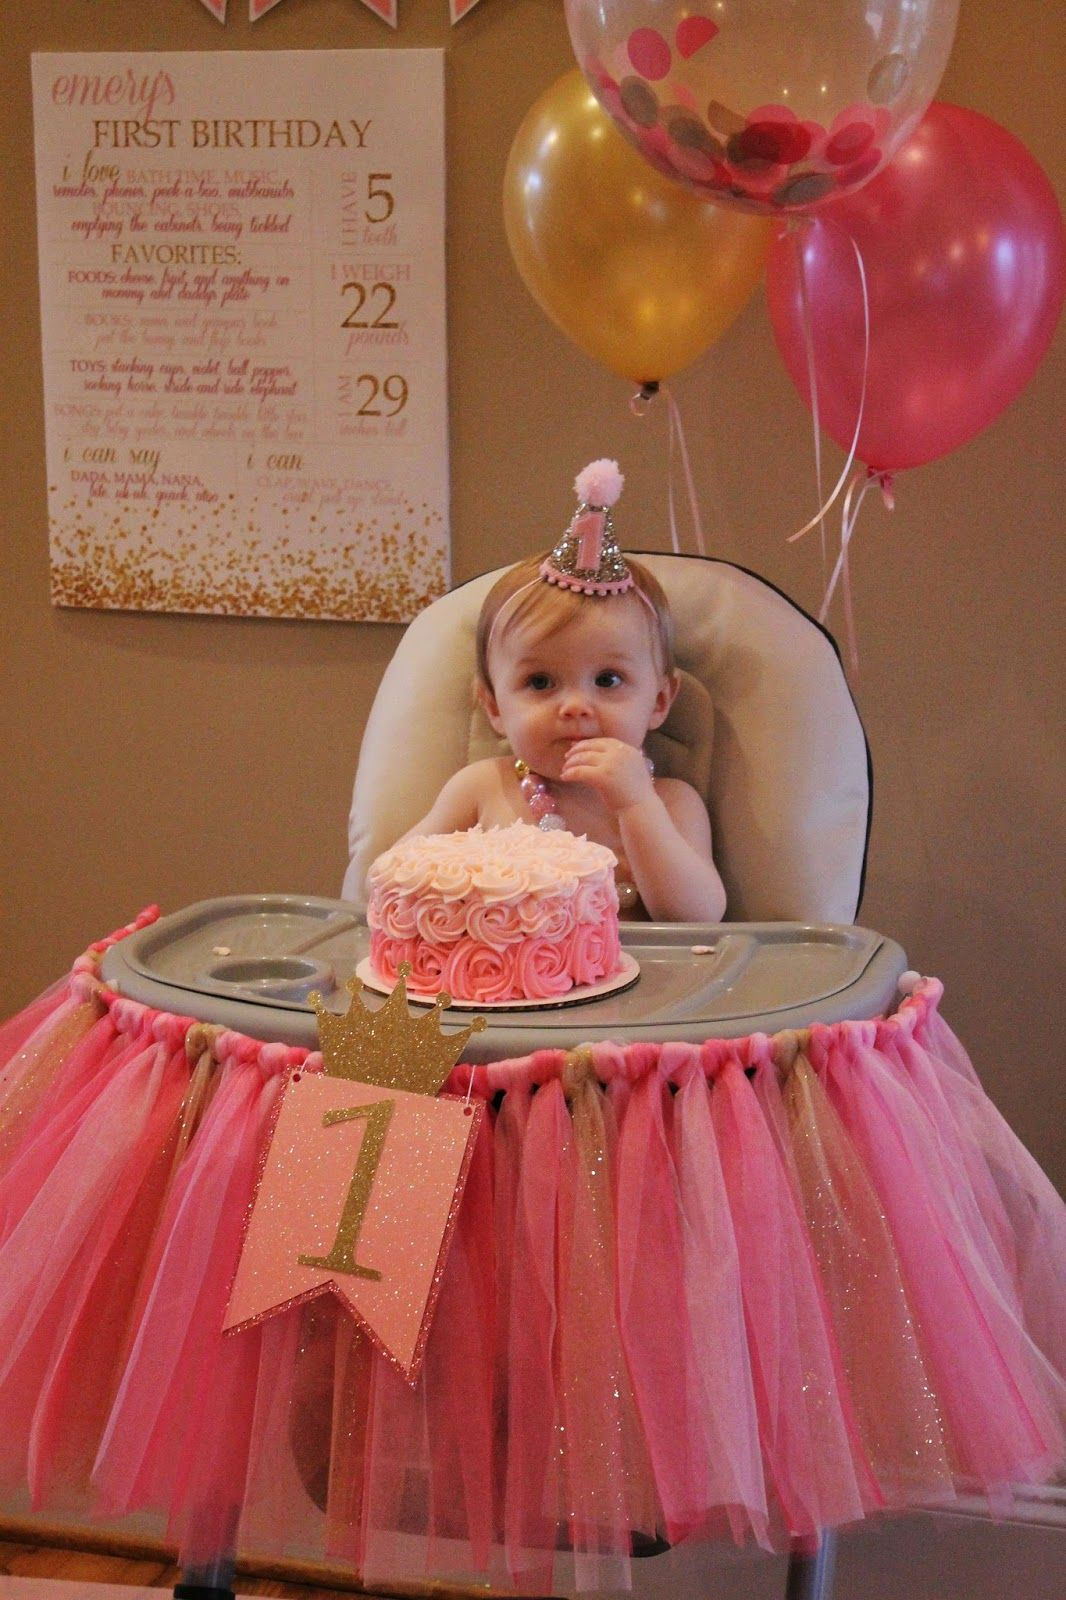 Emery S 1st Birthday Party First Birthday Parties 1st Birthday